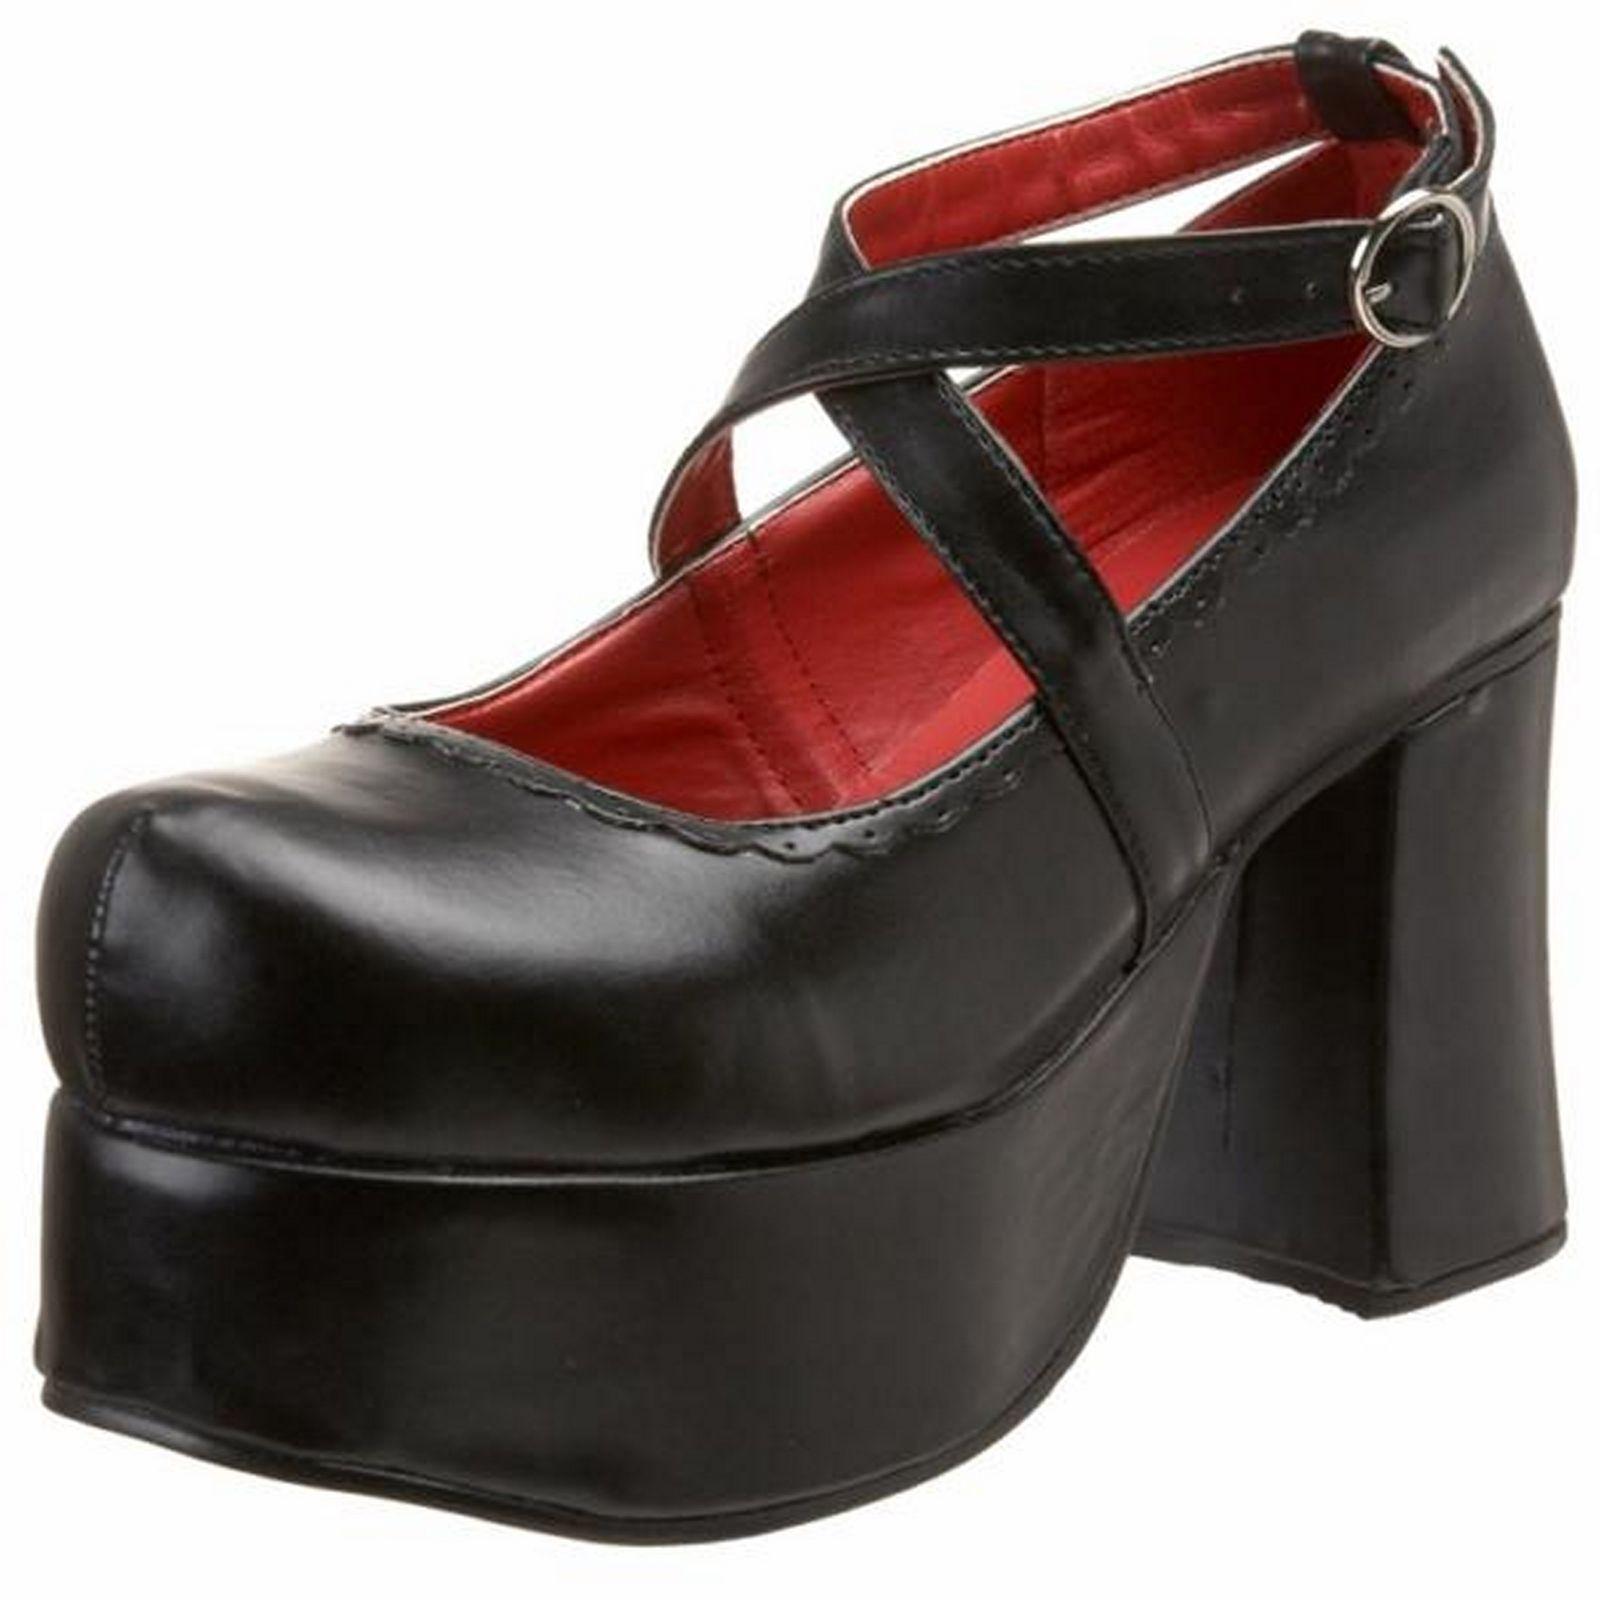 25260c1ff21 Demonia Shoes Goth Punk Clip On Bows Womens Abbey-03 Black Pu ...